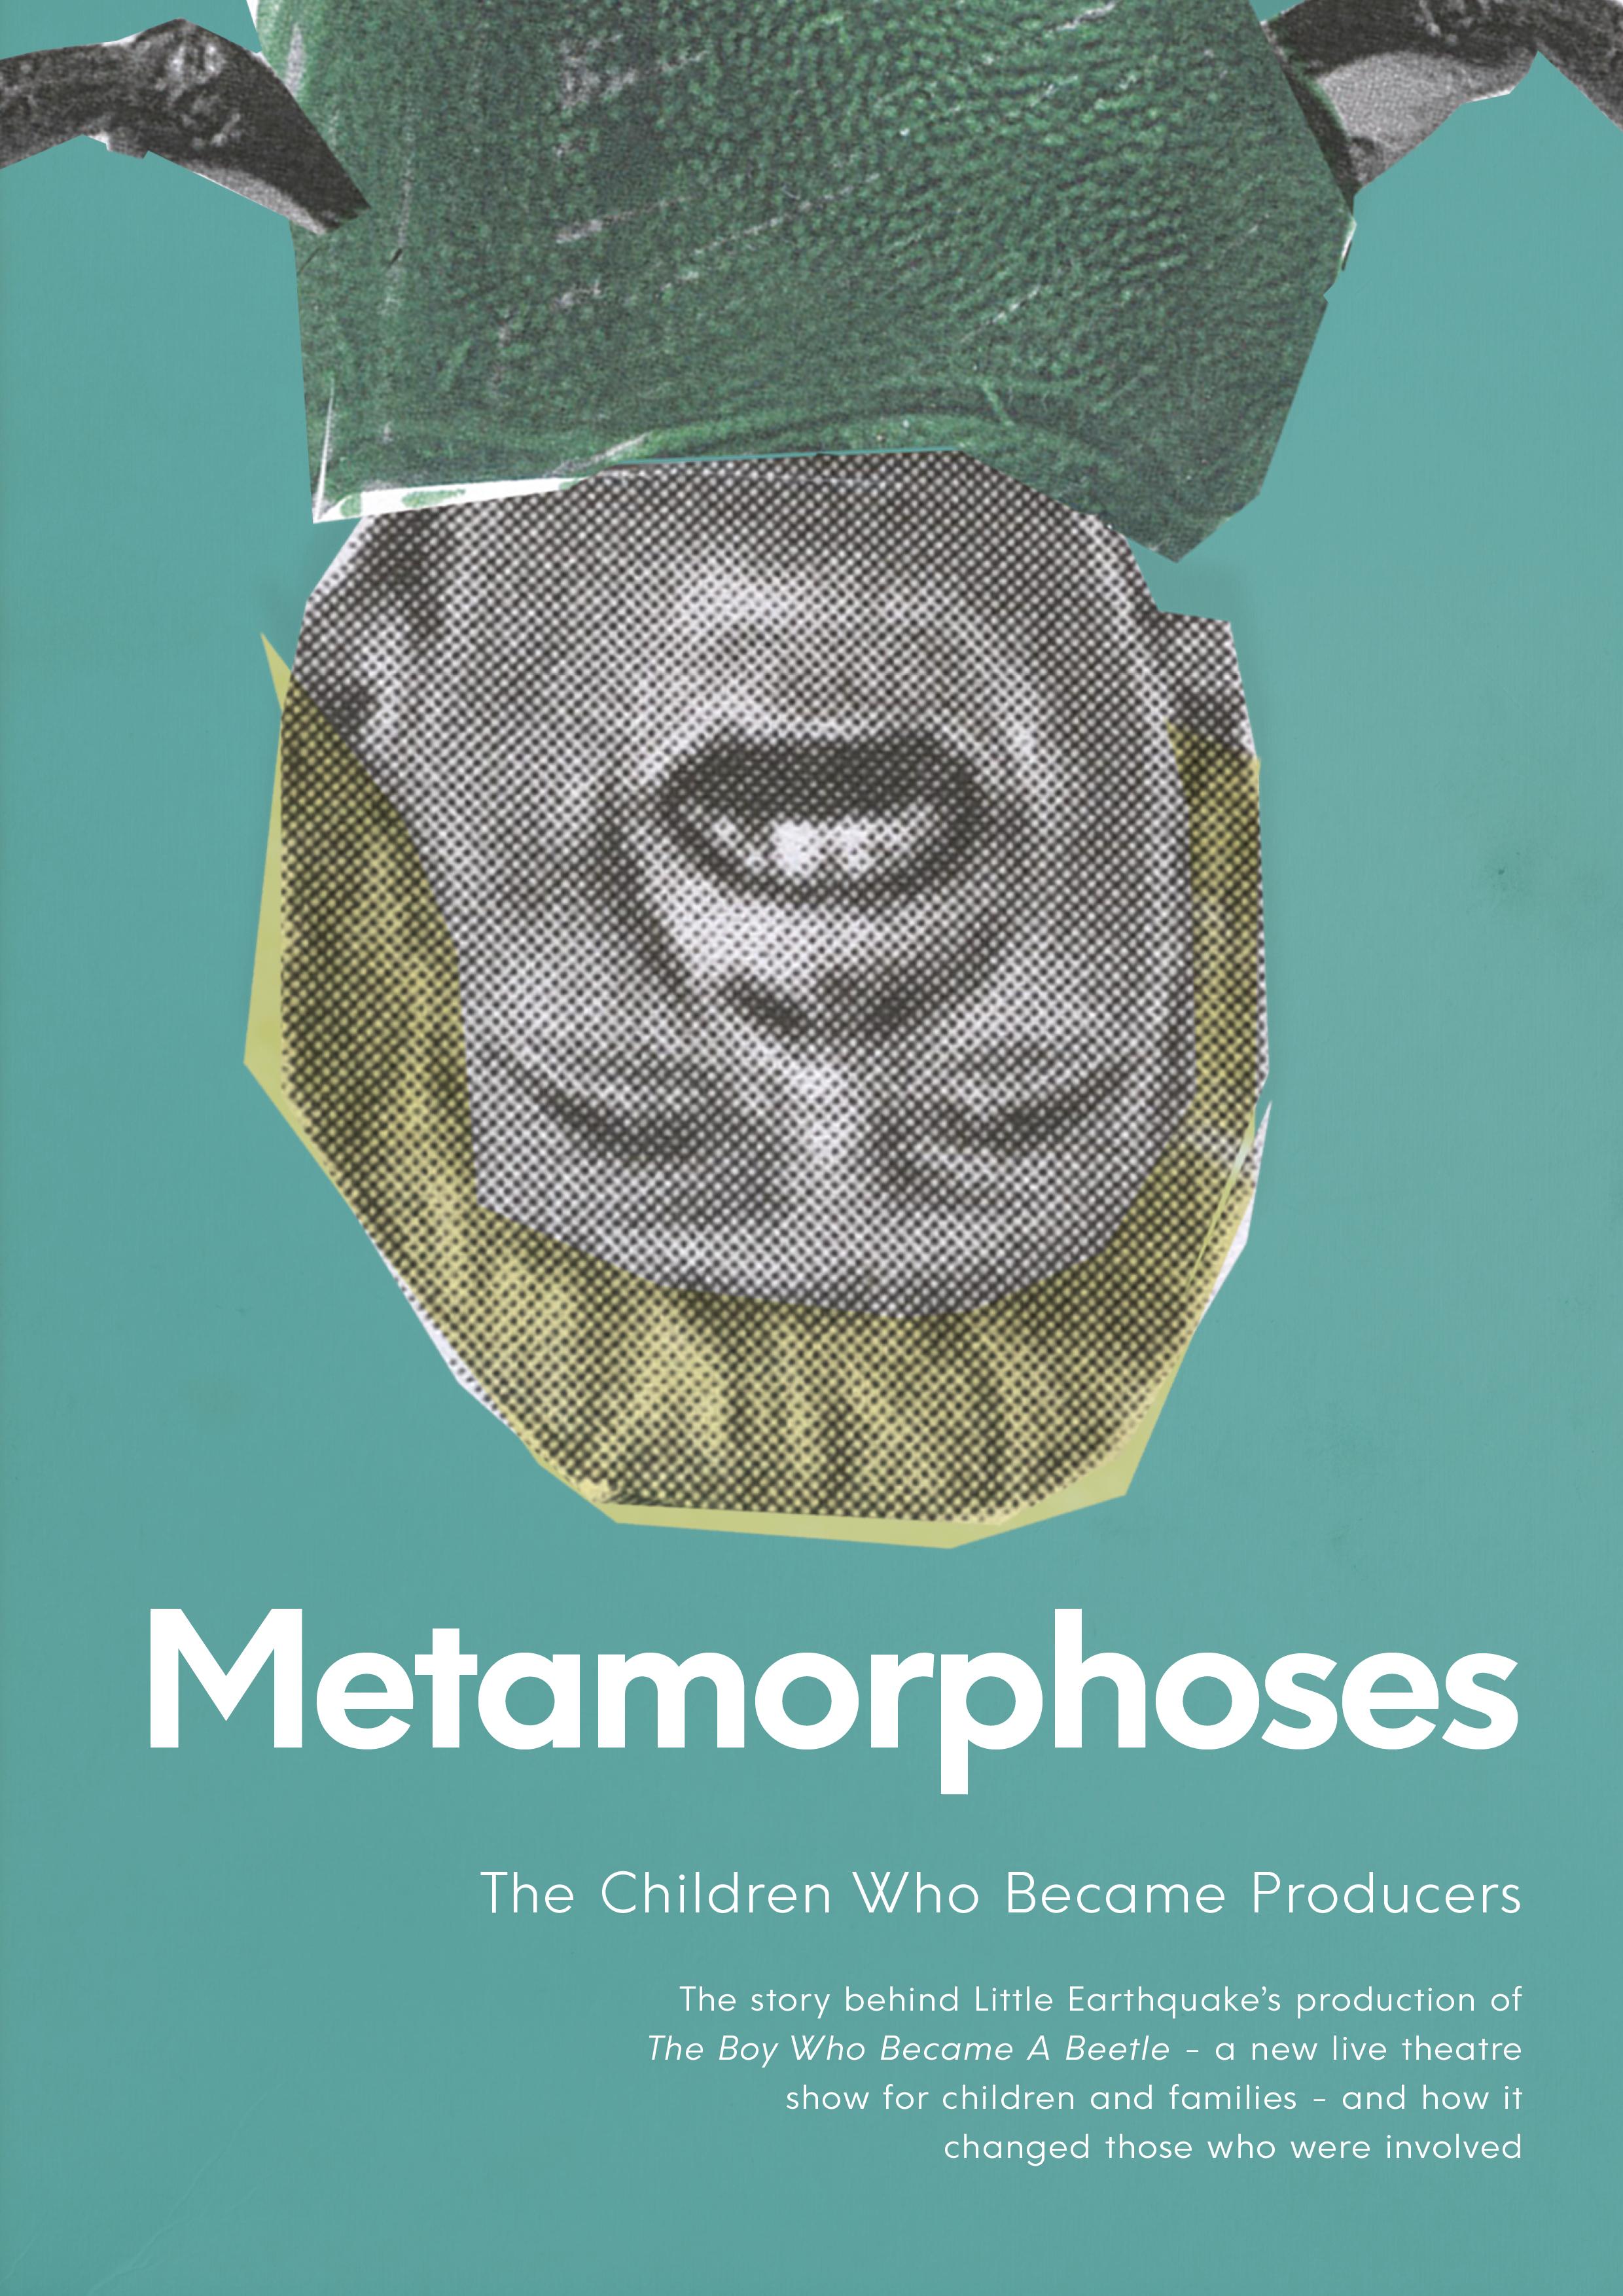 BWBAB Metamorphoses FINAL WEB SMALL.jpg